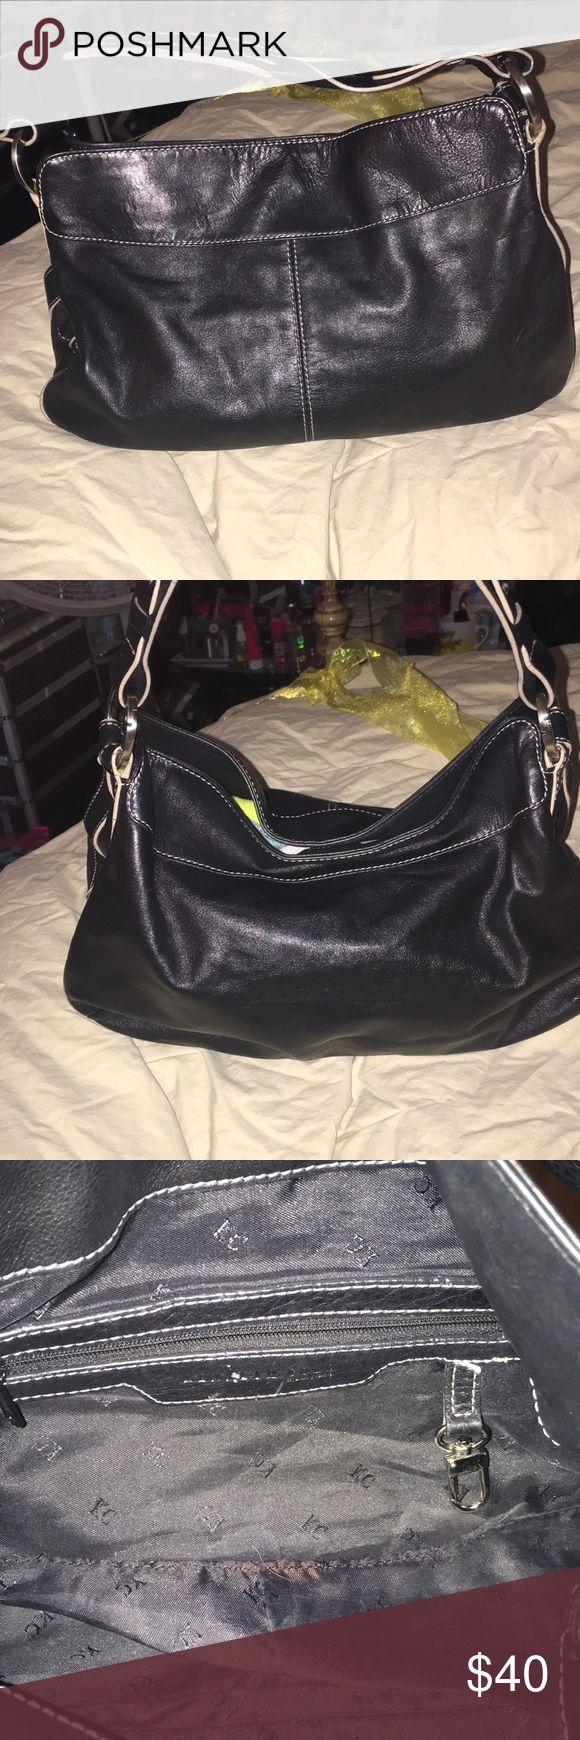 Soft Supple Bag Purse